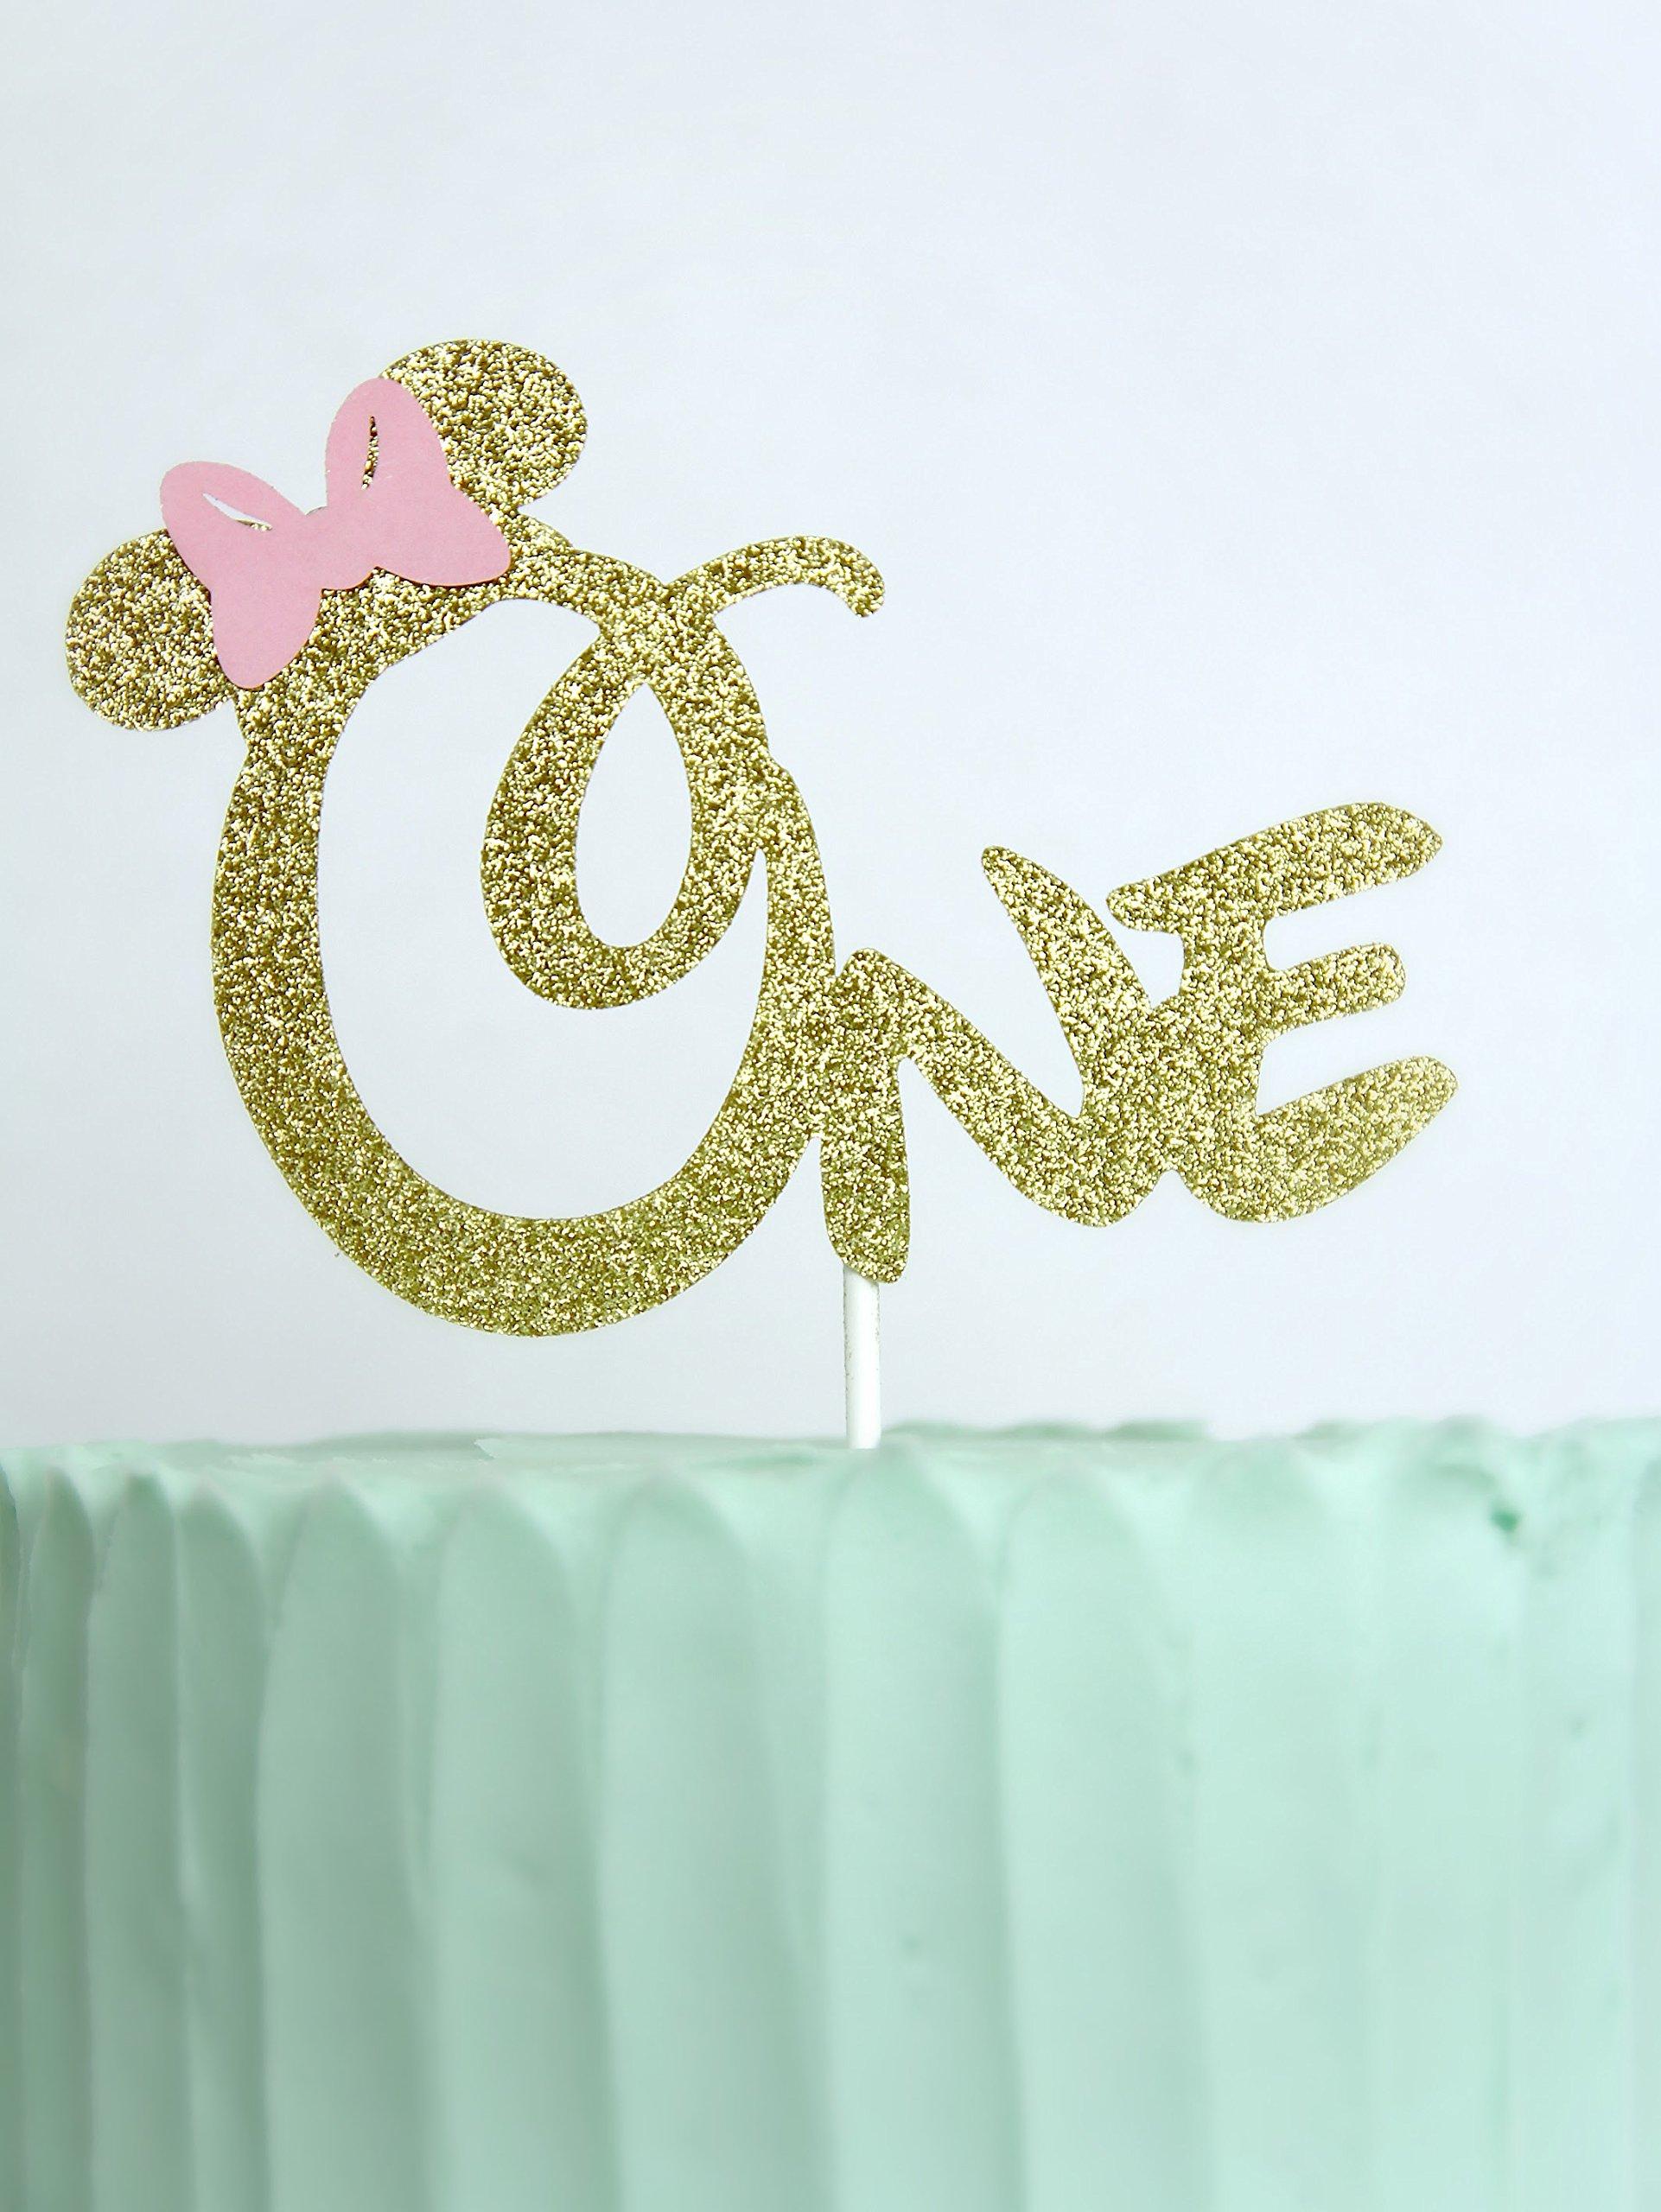 Surprising Cheap Minnie Mouse Birthday Cake Topper Find Minnie Mouse Funny Birthday Cards Online Kookostrdamsfinfo